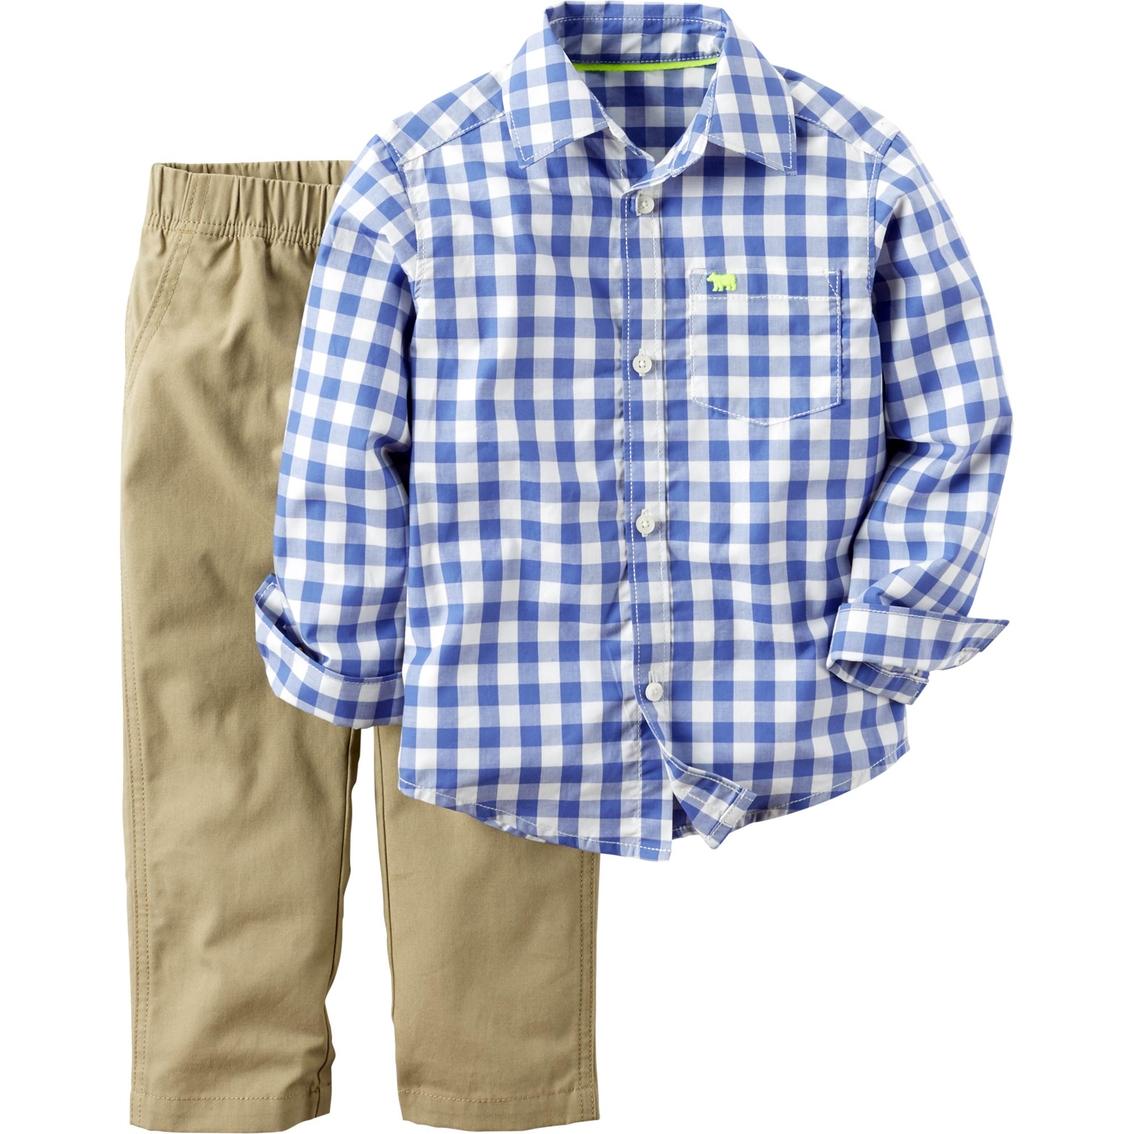 Carters Toddler Boys 2 Pc Blue Check Woven Shirt Khaki Pants Set